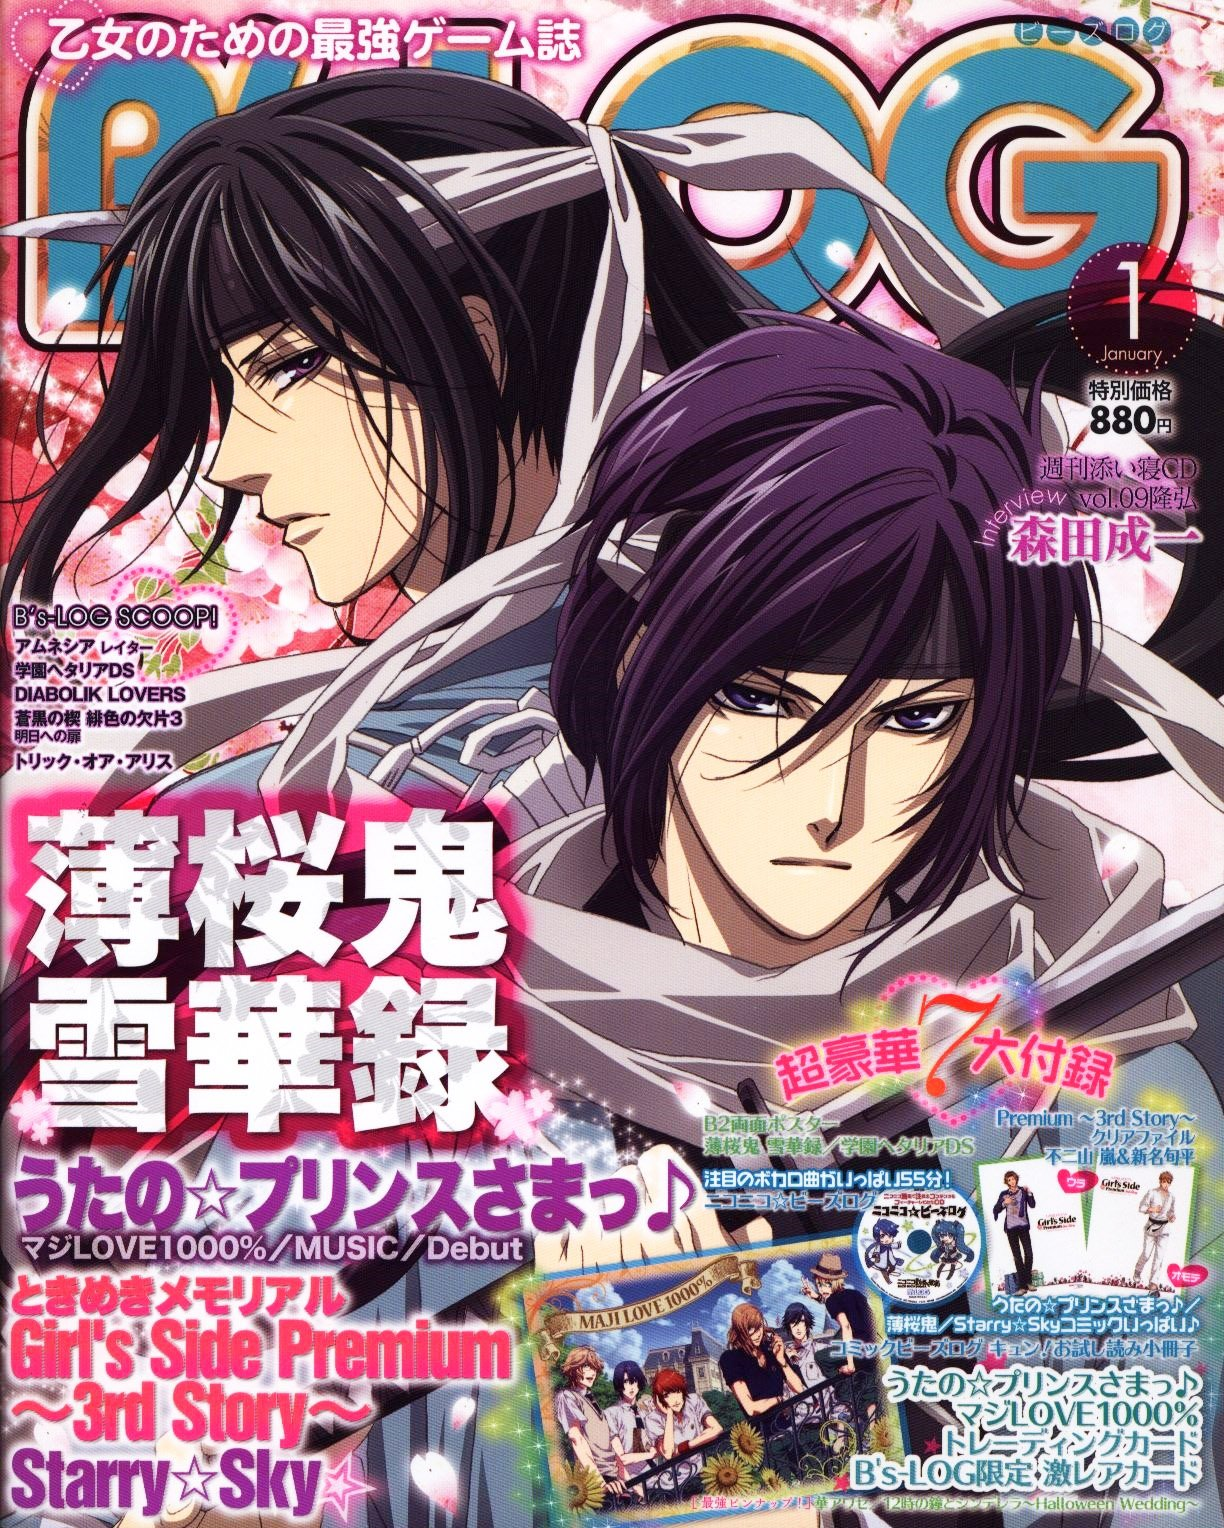 B's-LOG Issue 104 (January 2012)